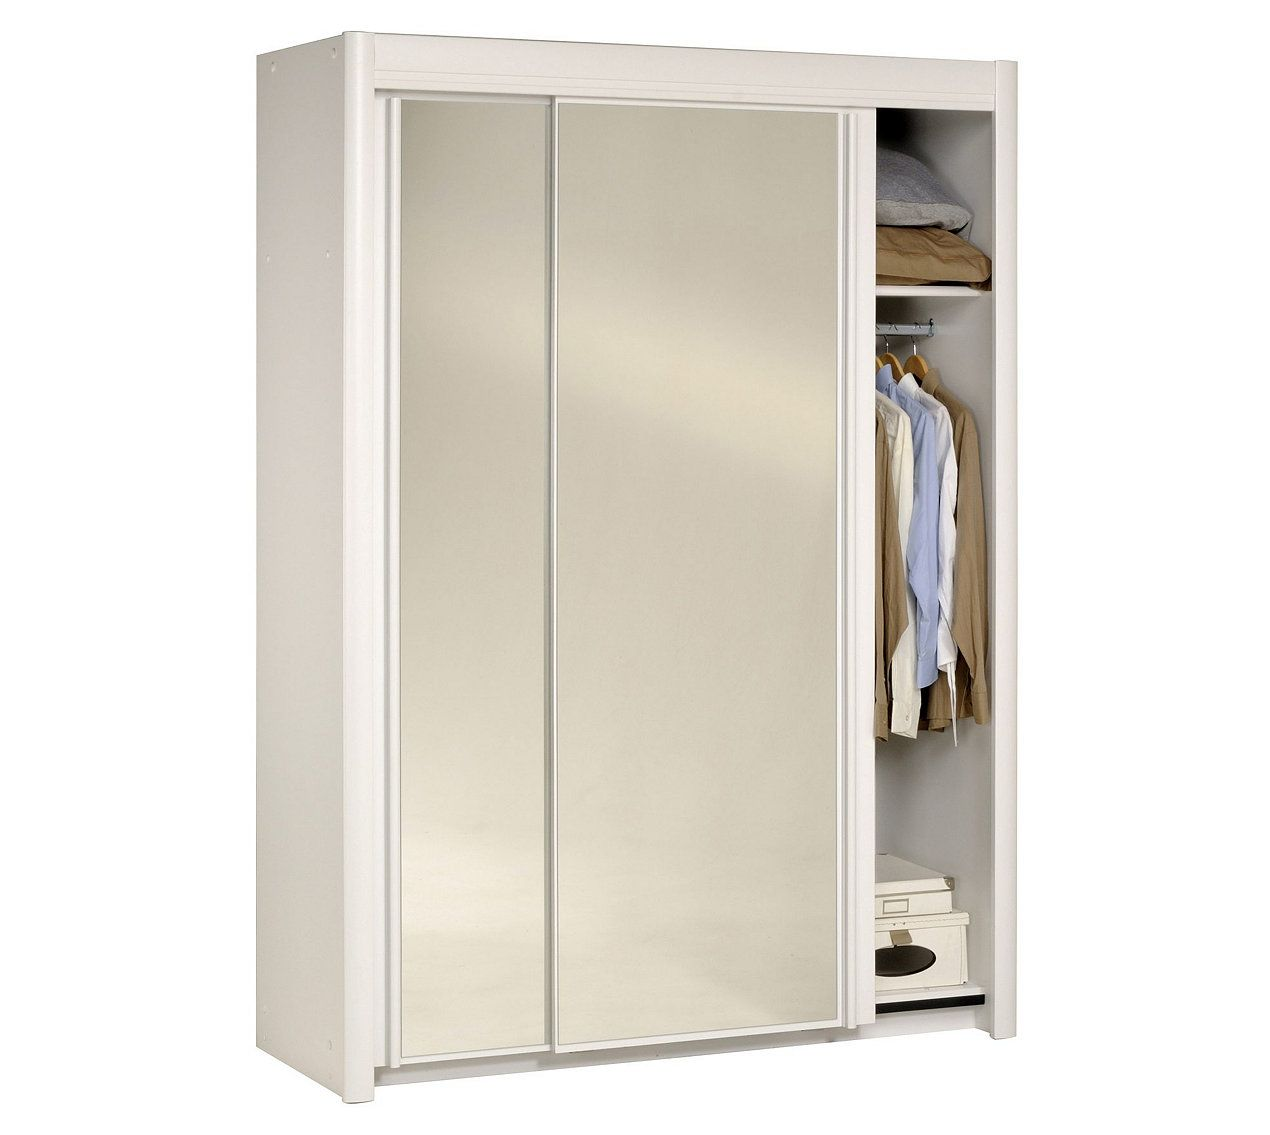 Armoire L 156 Cm Carla 2 4973r161 Blanc Armoires But Armoire Chambre Ikea Armoire Chambre Armoire De Cuisine